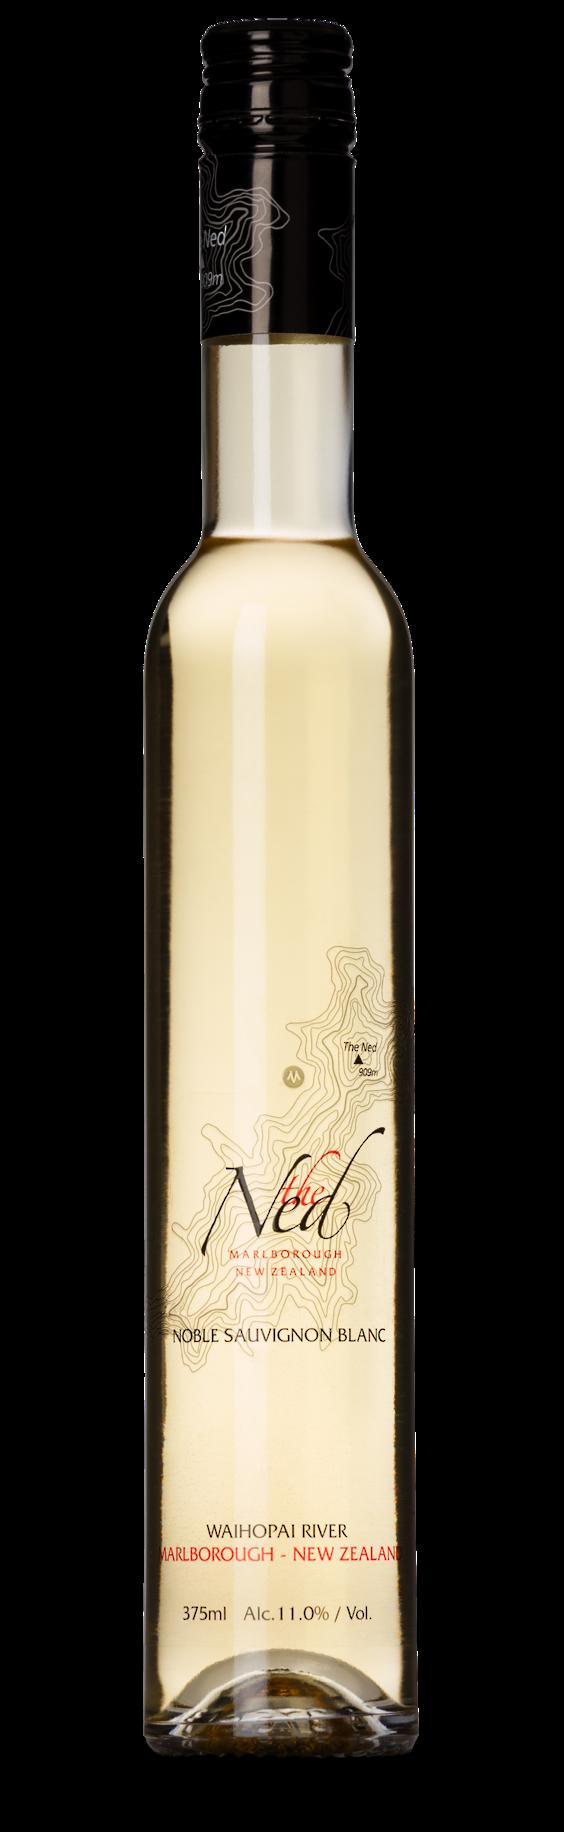 The Ned Noble Sauvignon Blanc 2019 image 0